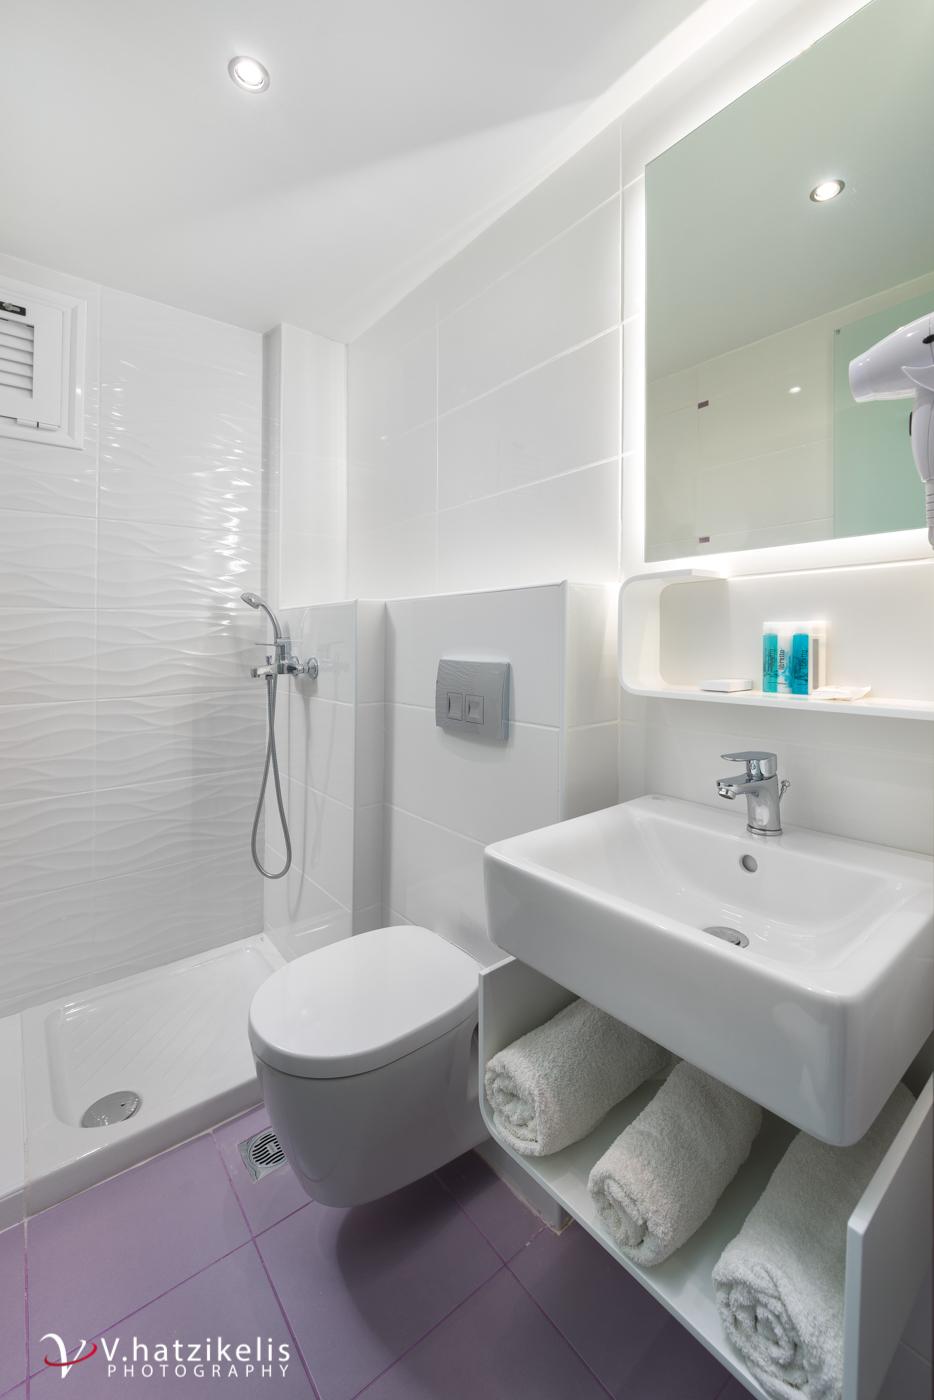 v hatzikelis photography Semiramis hotel-44